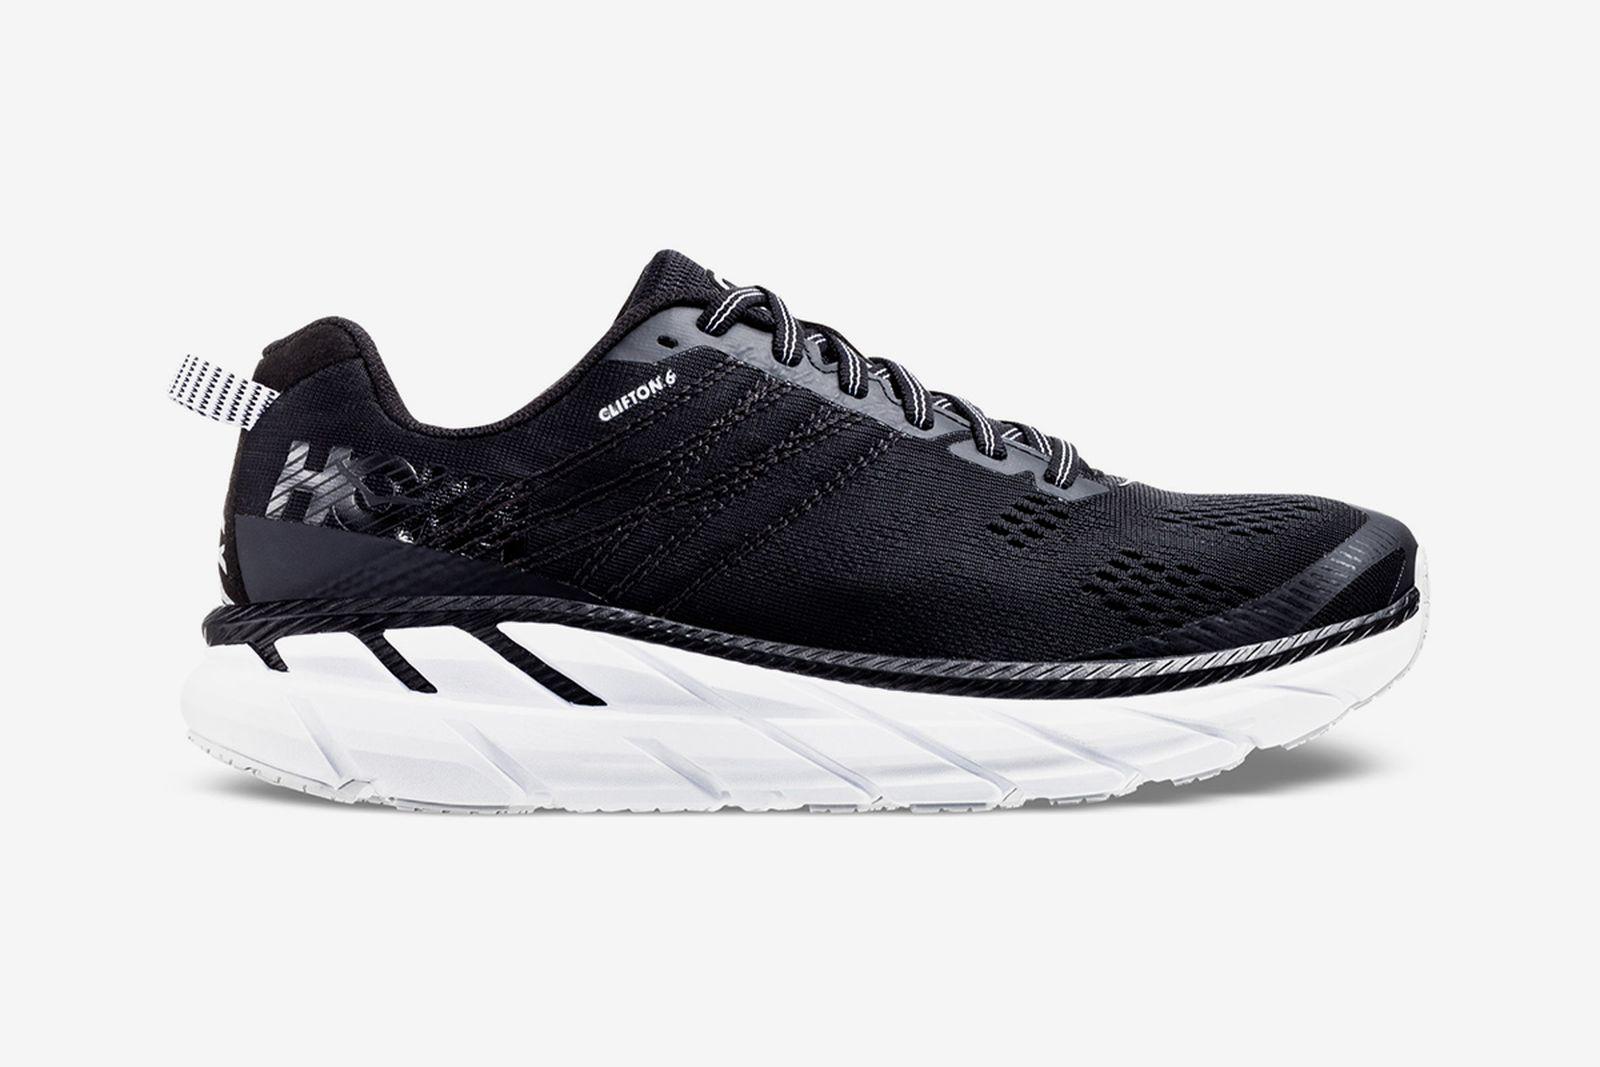 best-running-shoes-for-men-guide-hoka-clifton06